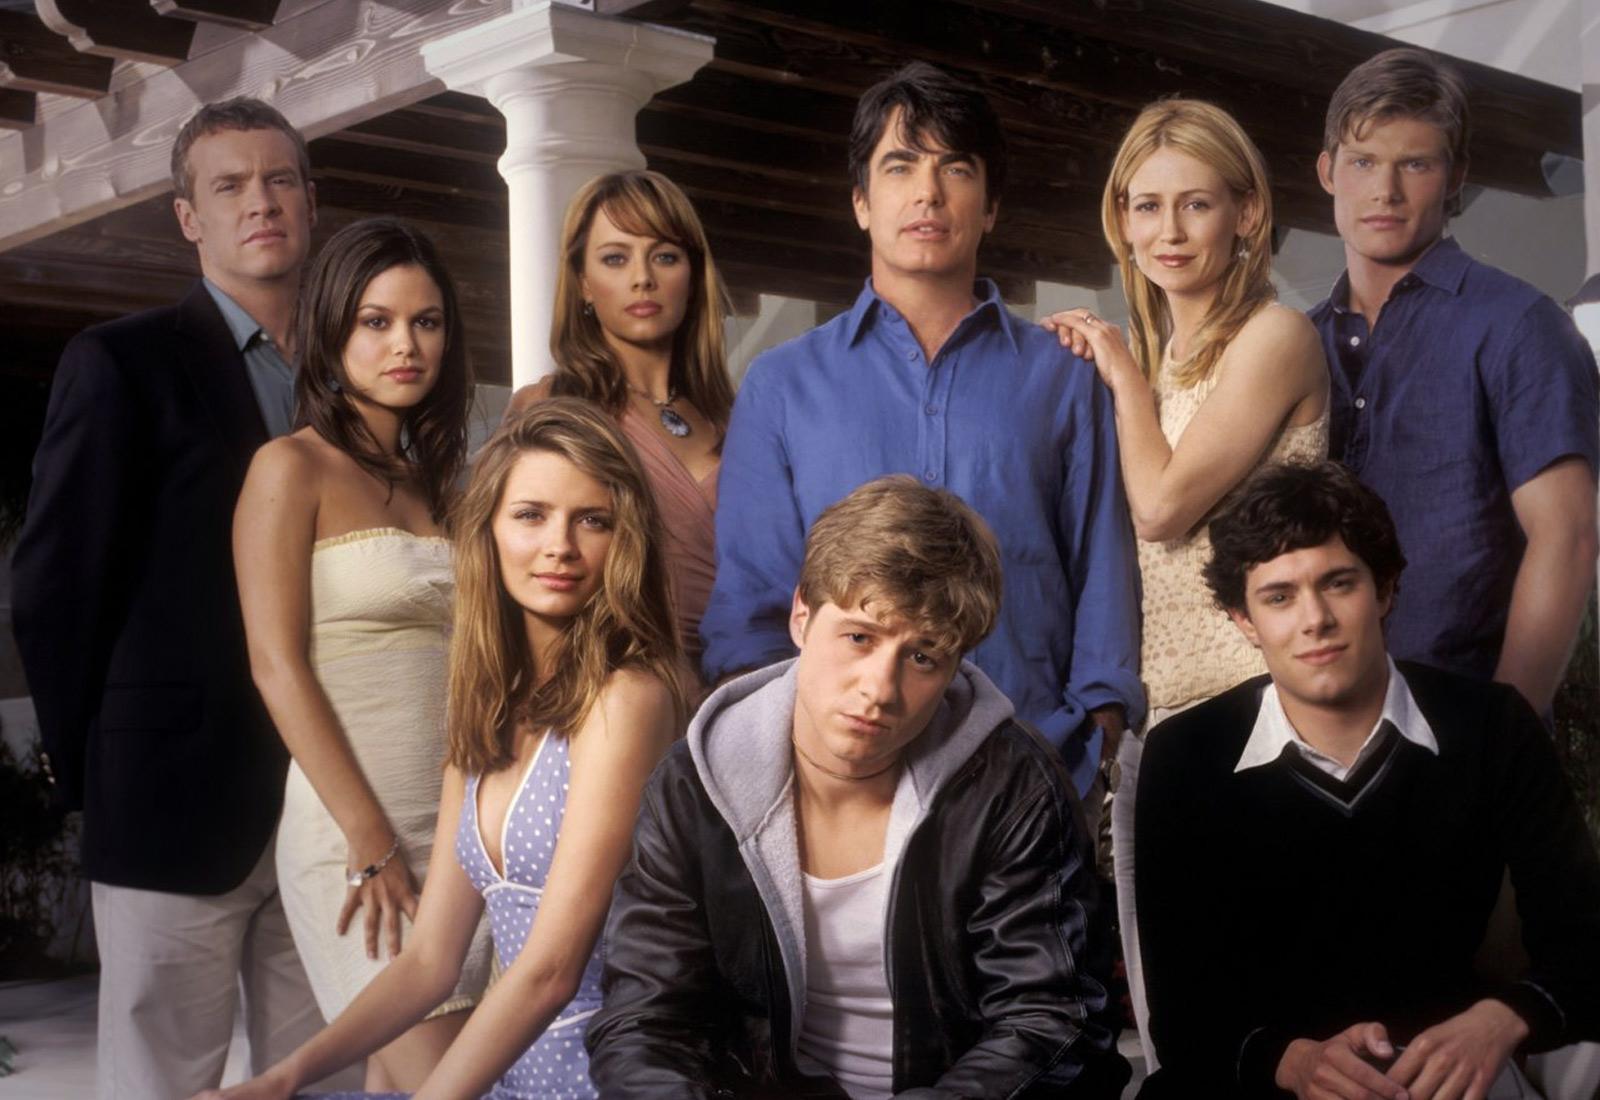 the oc season 1 full episodes online free